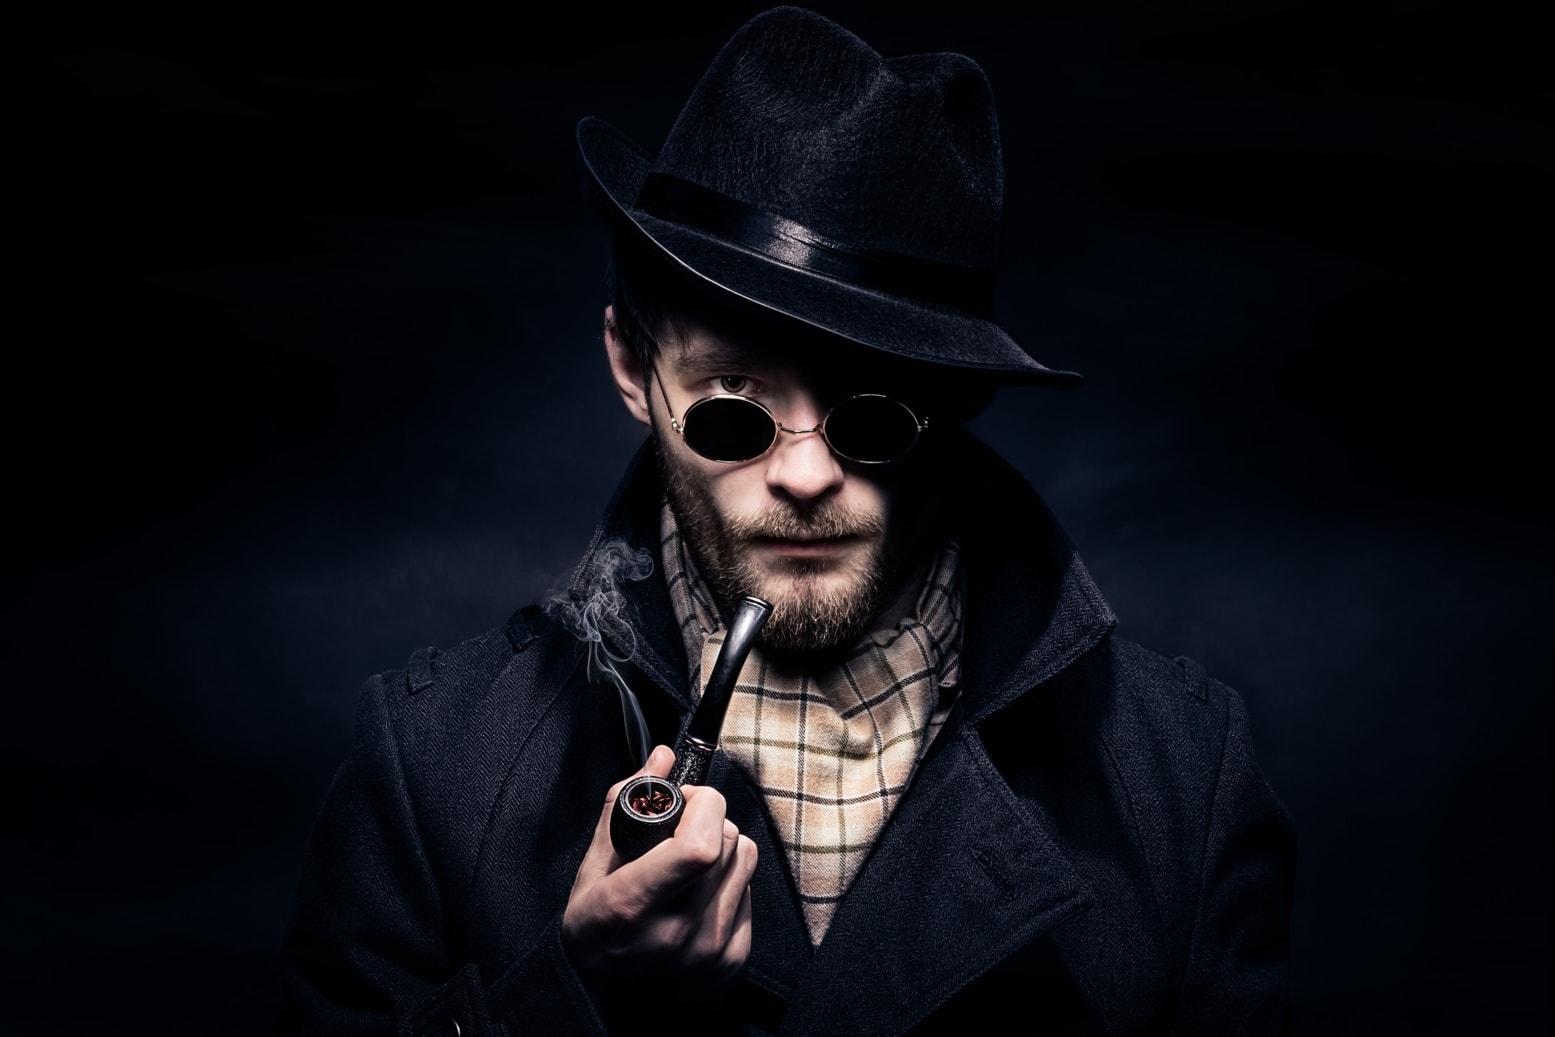 Mann im Sherlock Holmes Kostüm